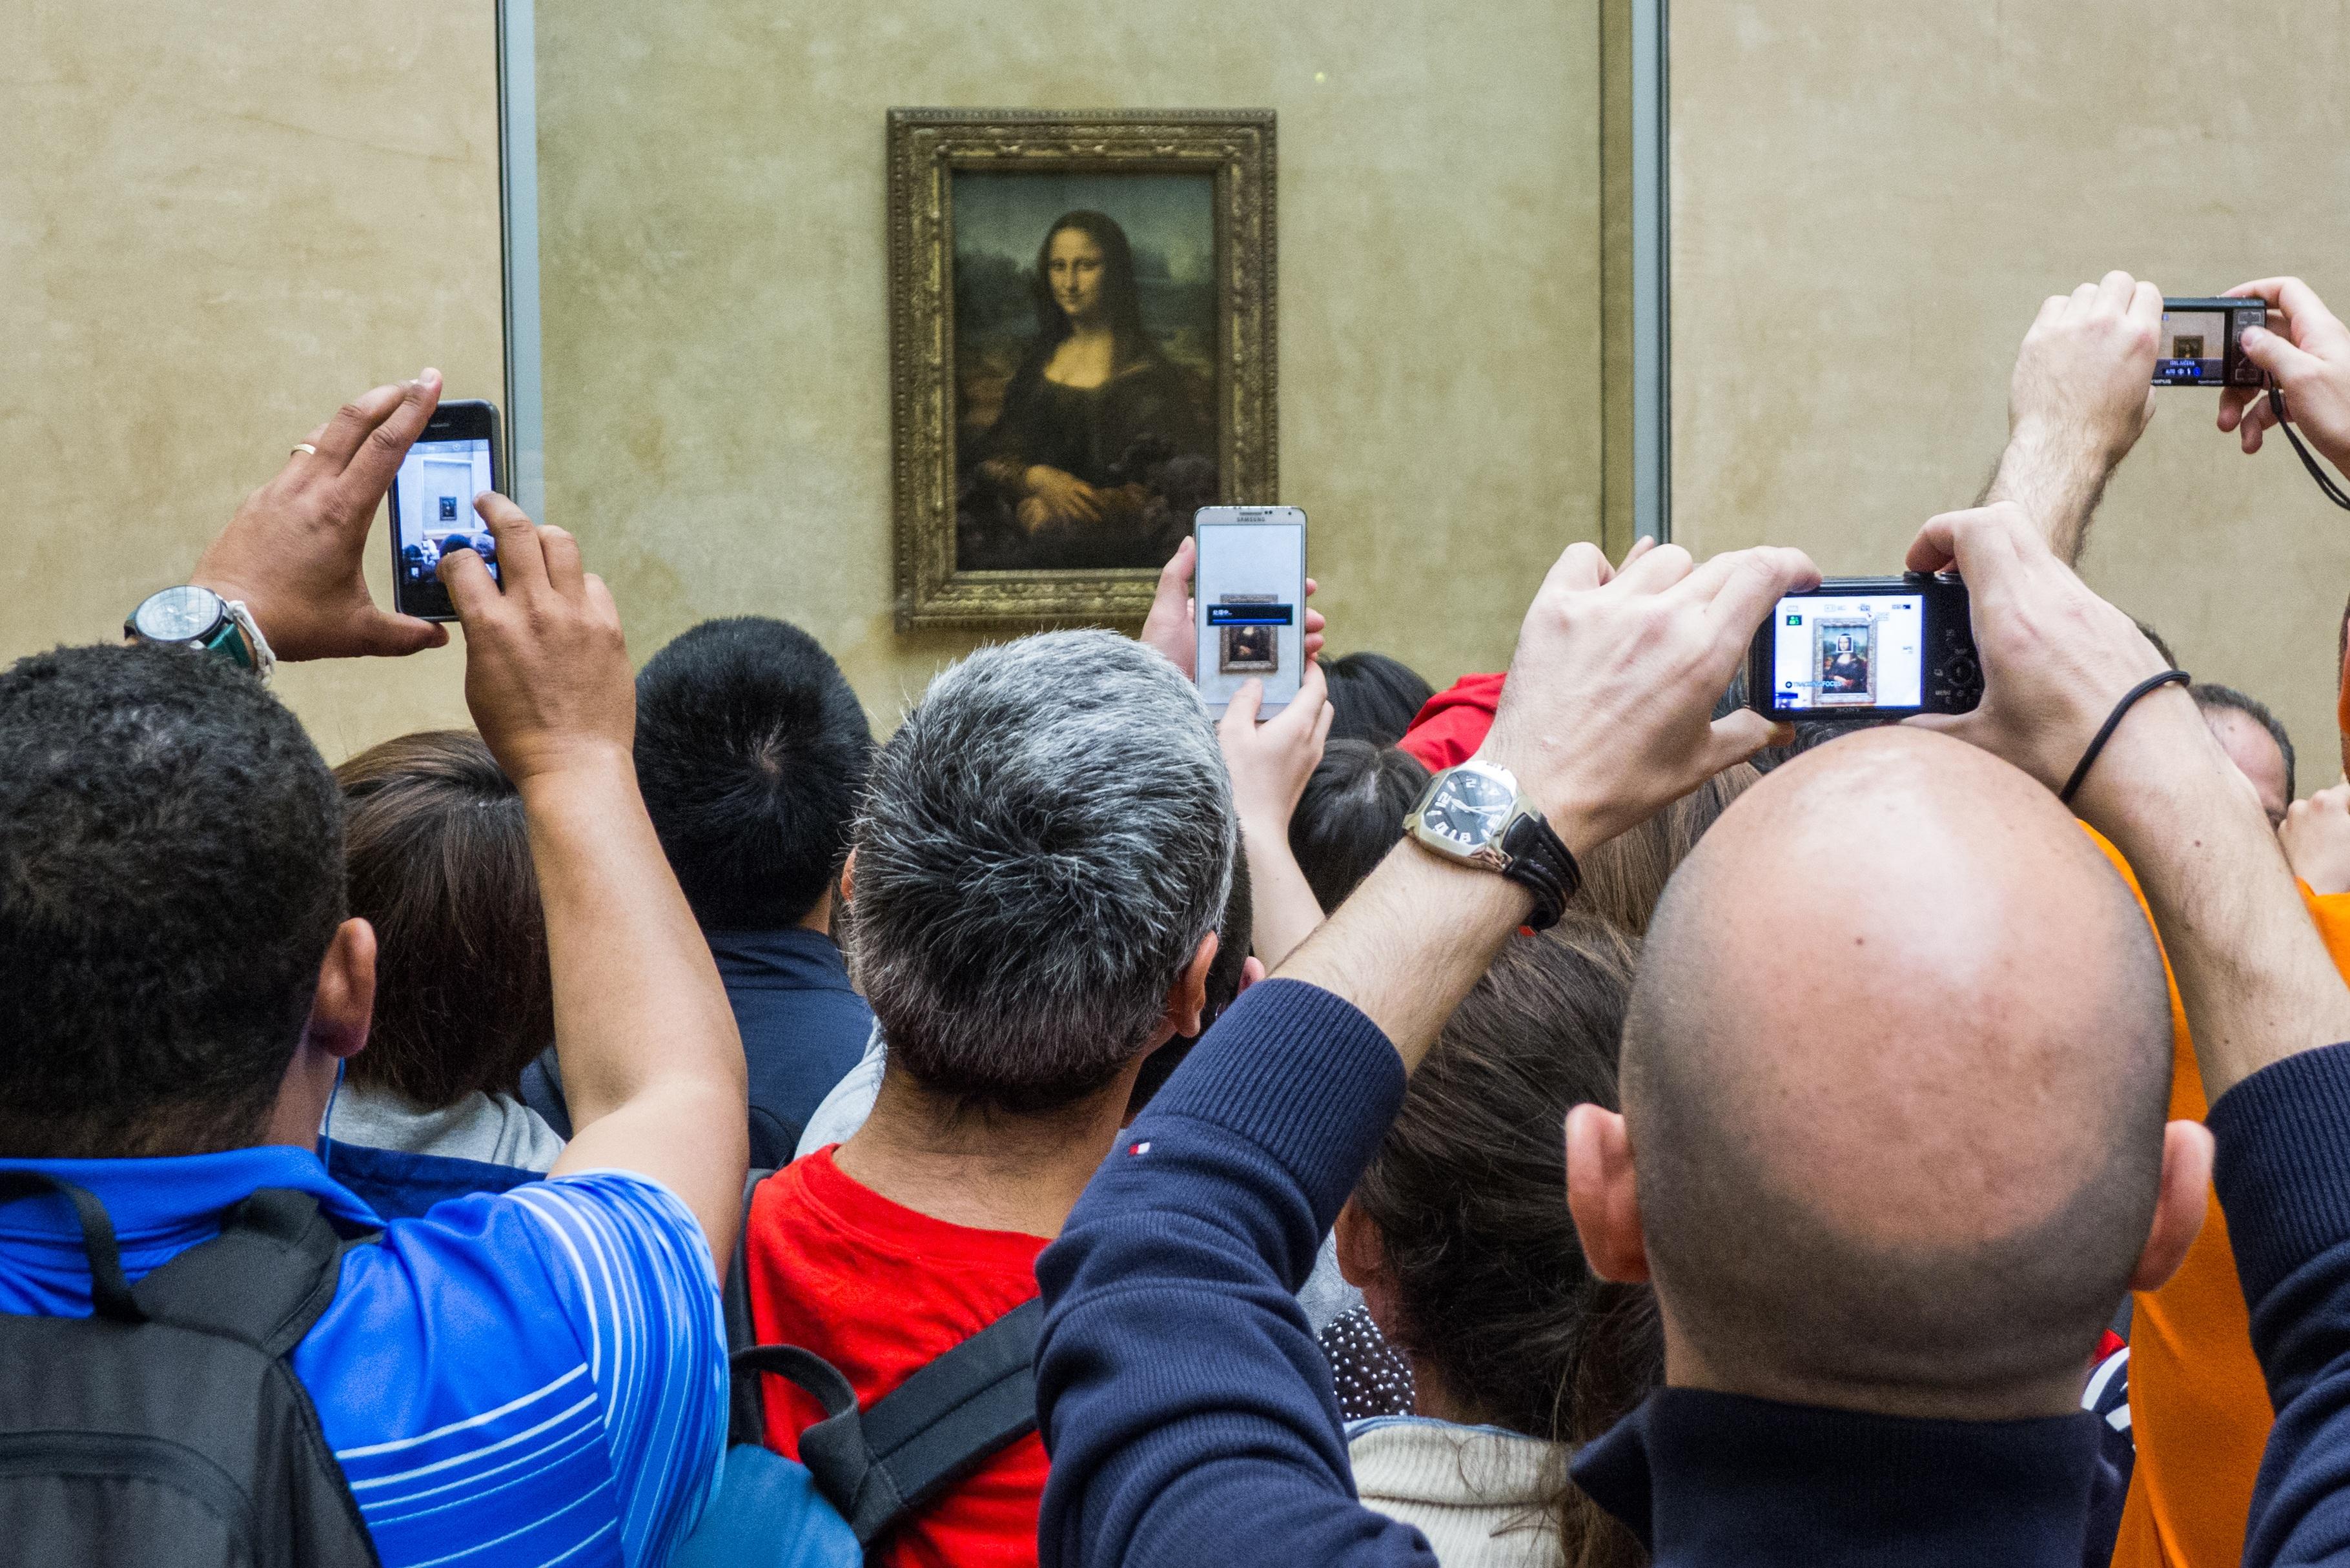 Gambar Orang Orang Kamera Juru Potret Paris Orang